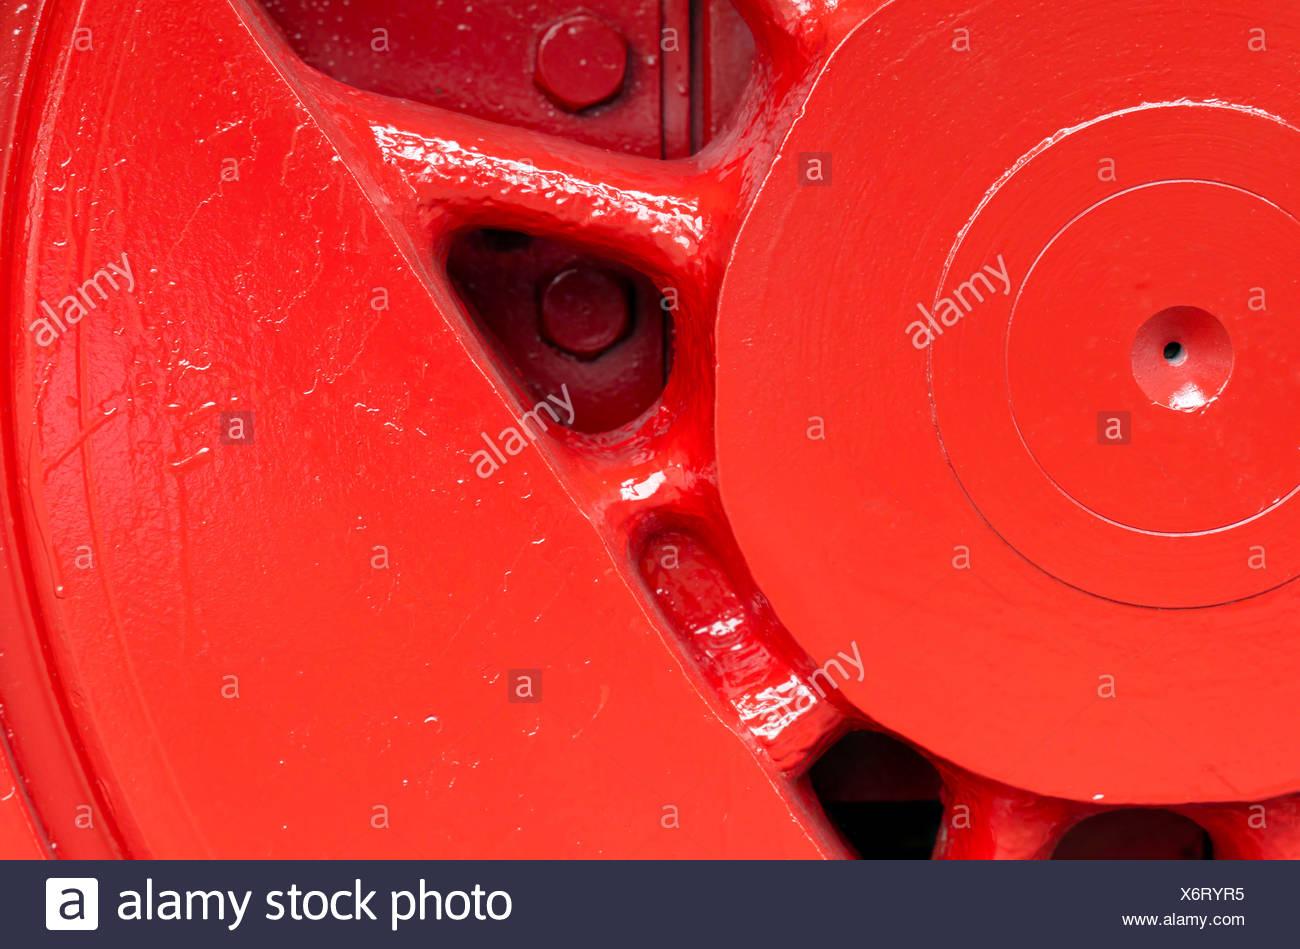 a steam locomotive closeup - Stock Image